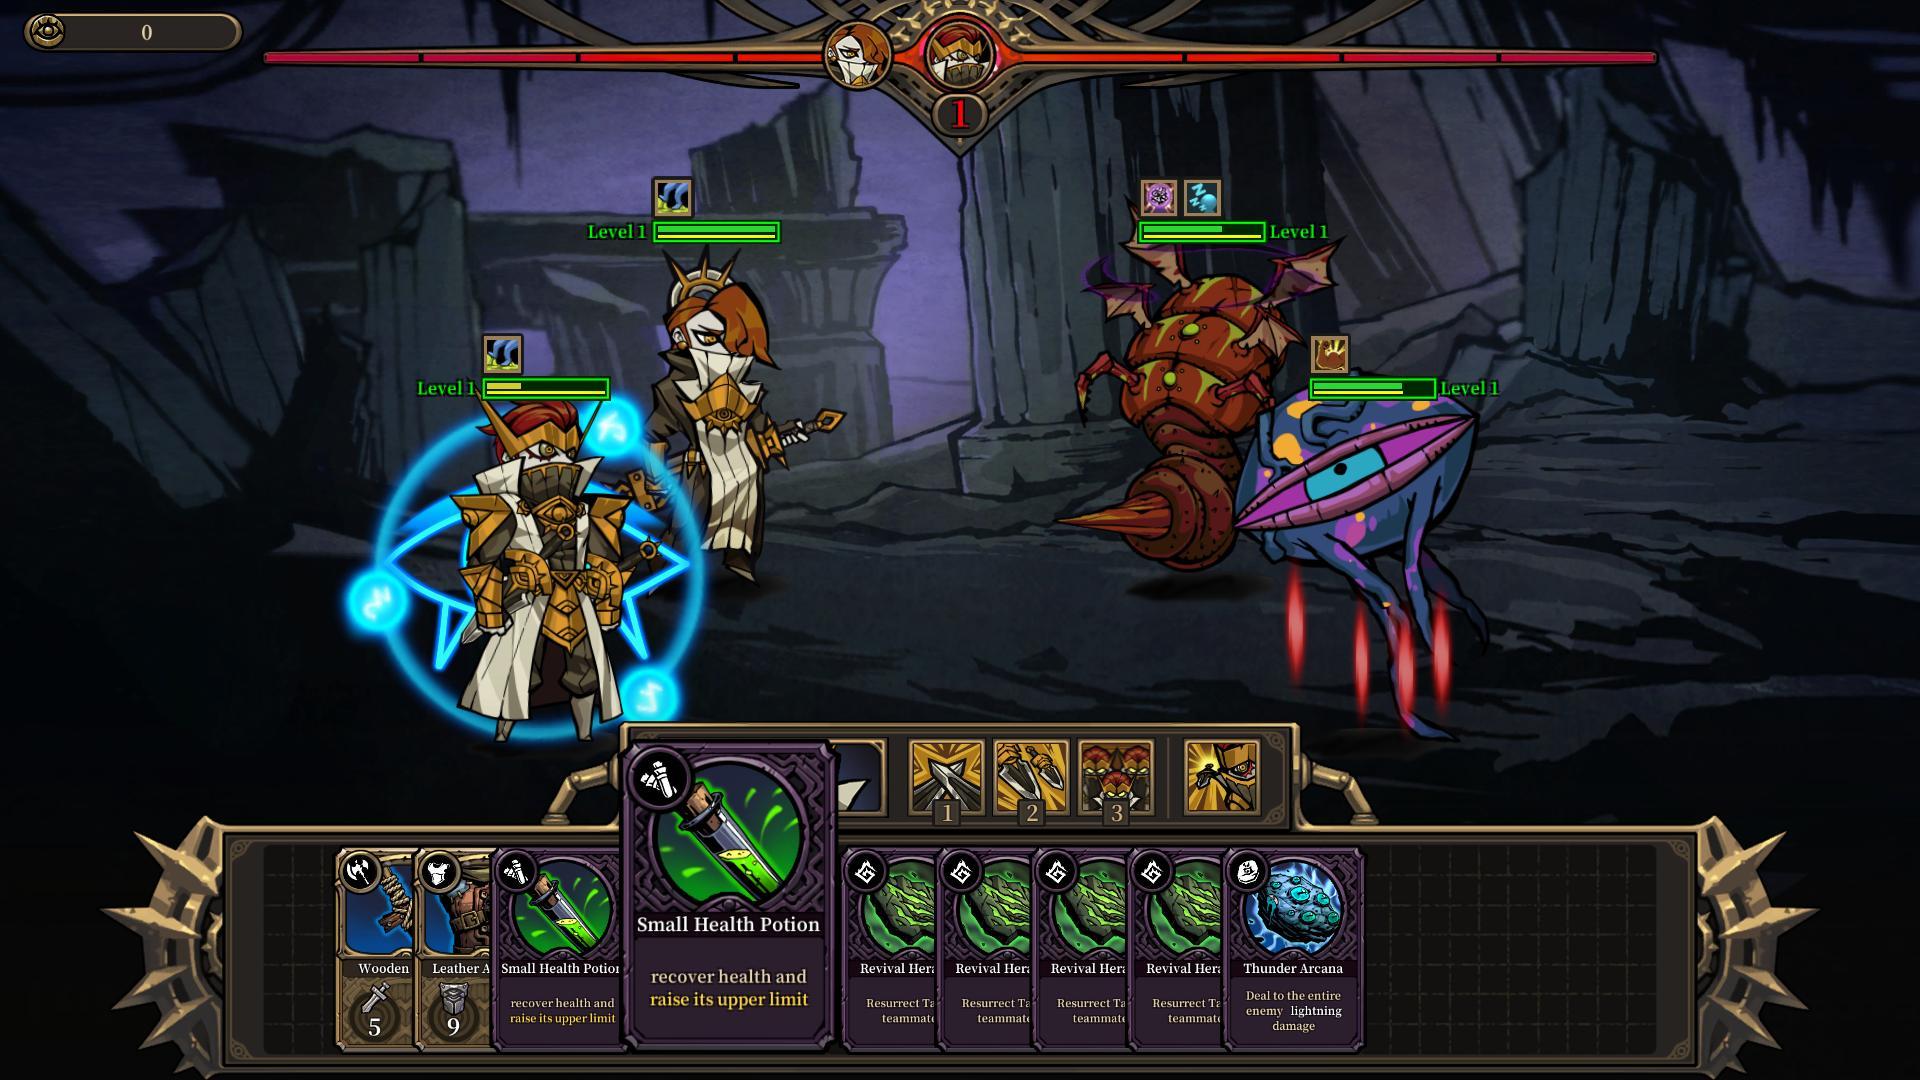 Скриншоты к Mad Crown v0.1.18.6602 - полная версия